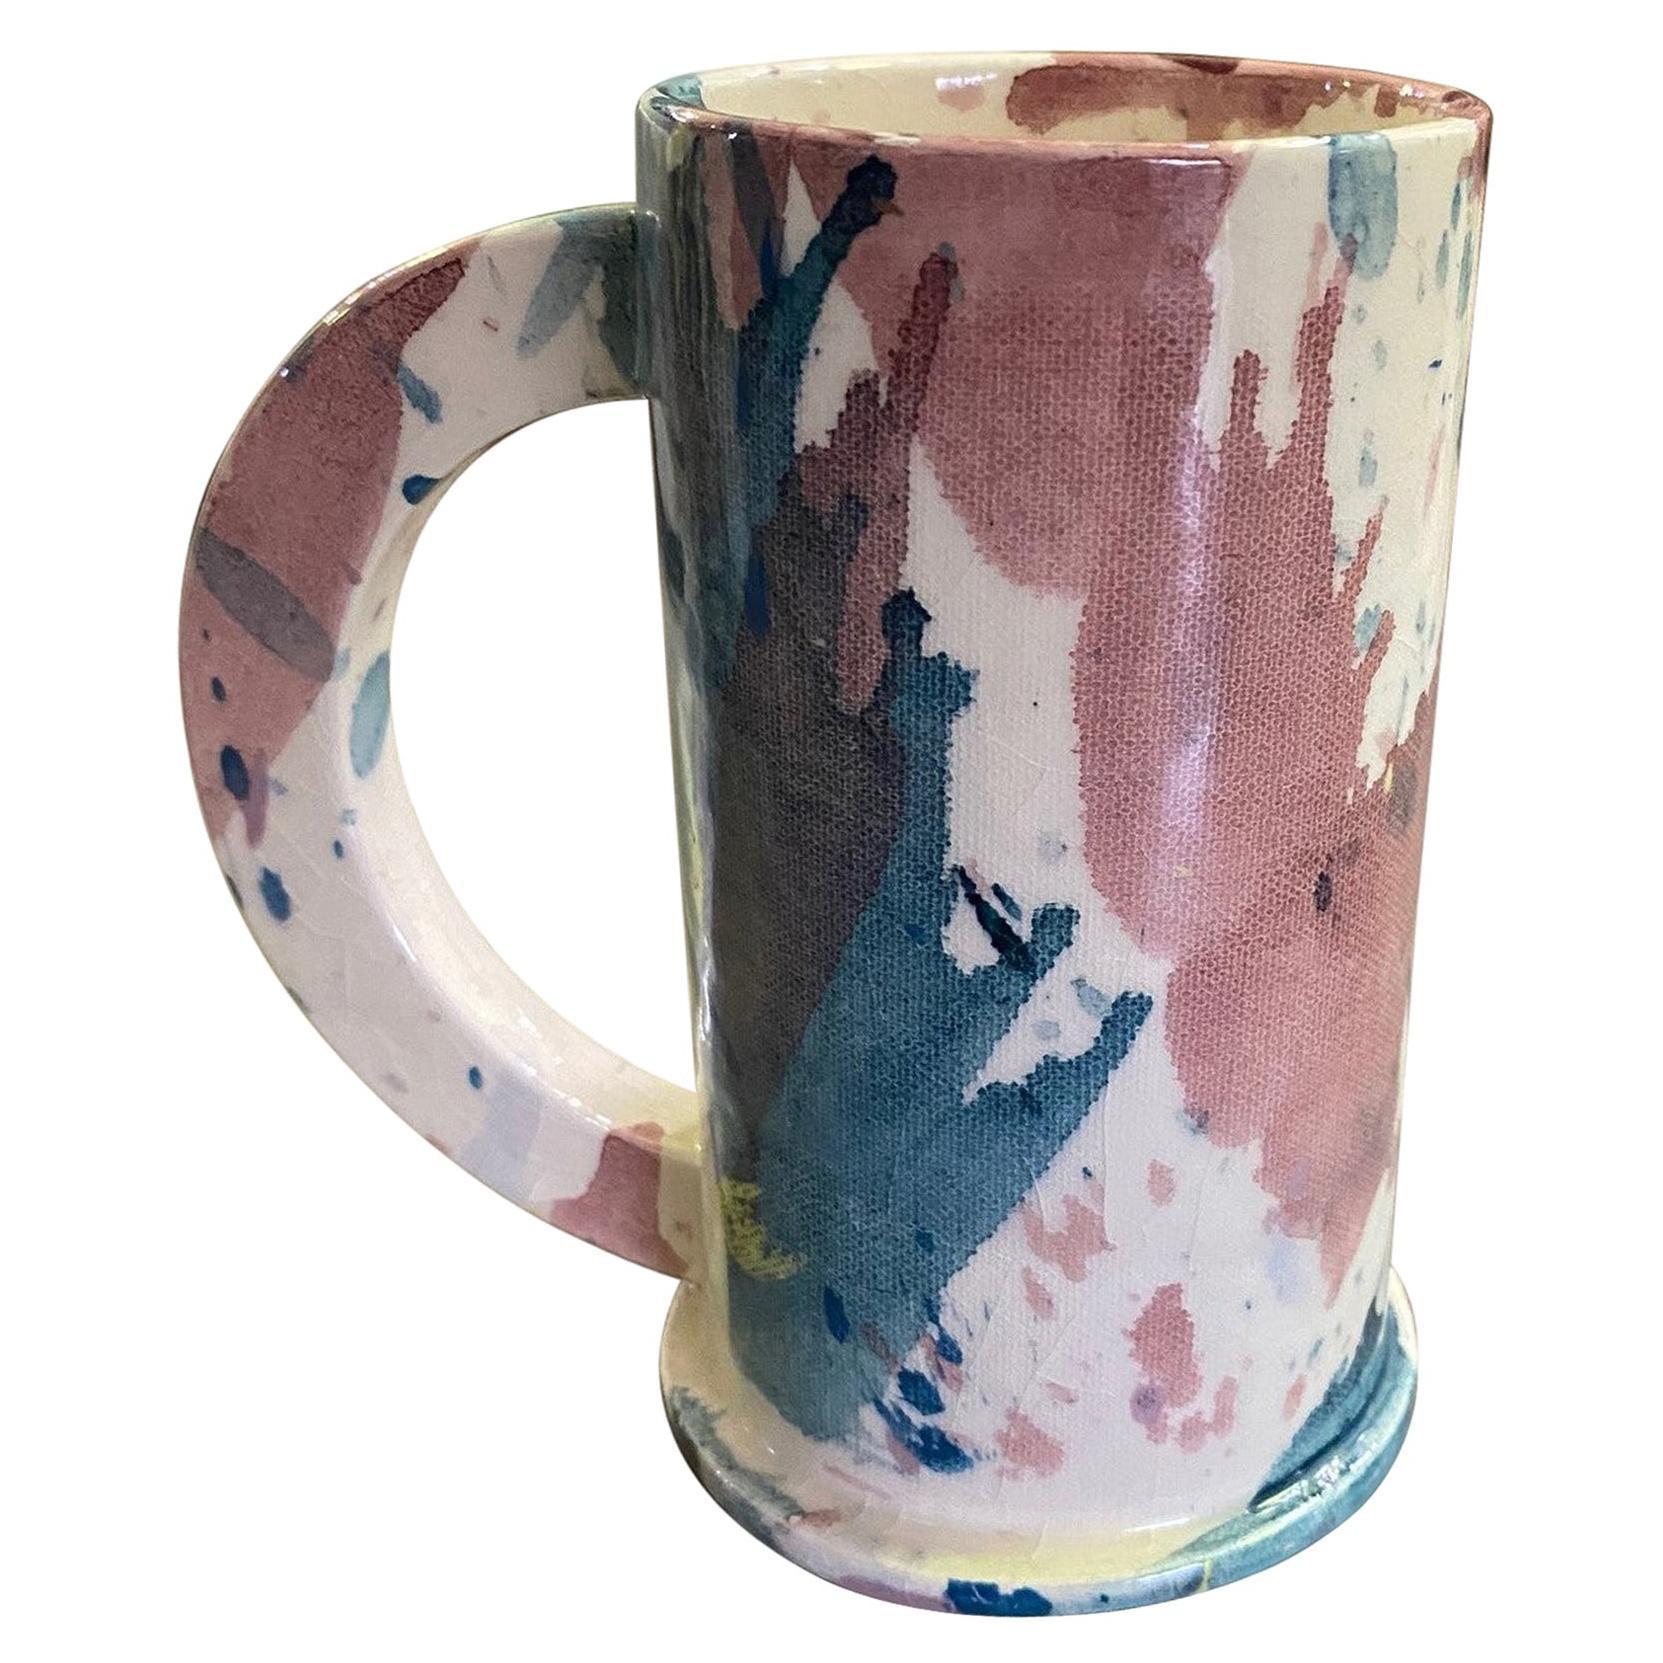 Peter Shire EXP Signed Ceramic Pottery Splatter Tall Mug Sculpture, Dated 1981